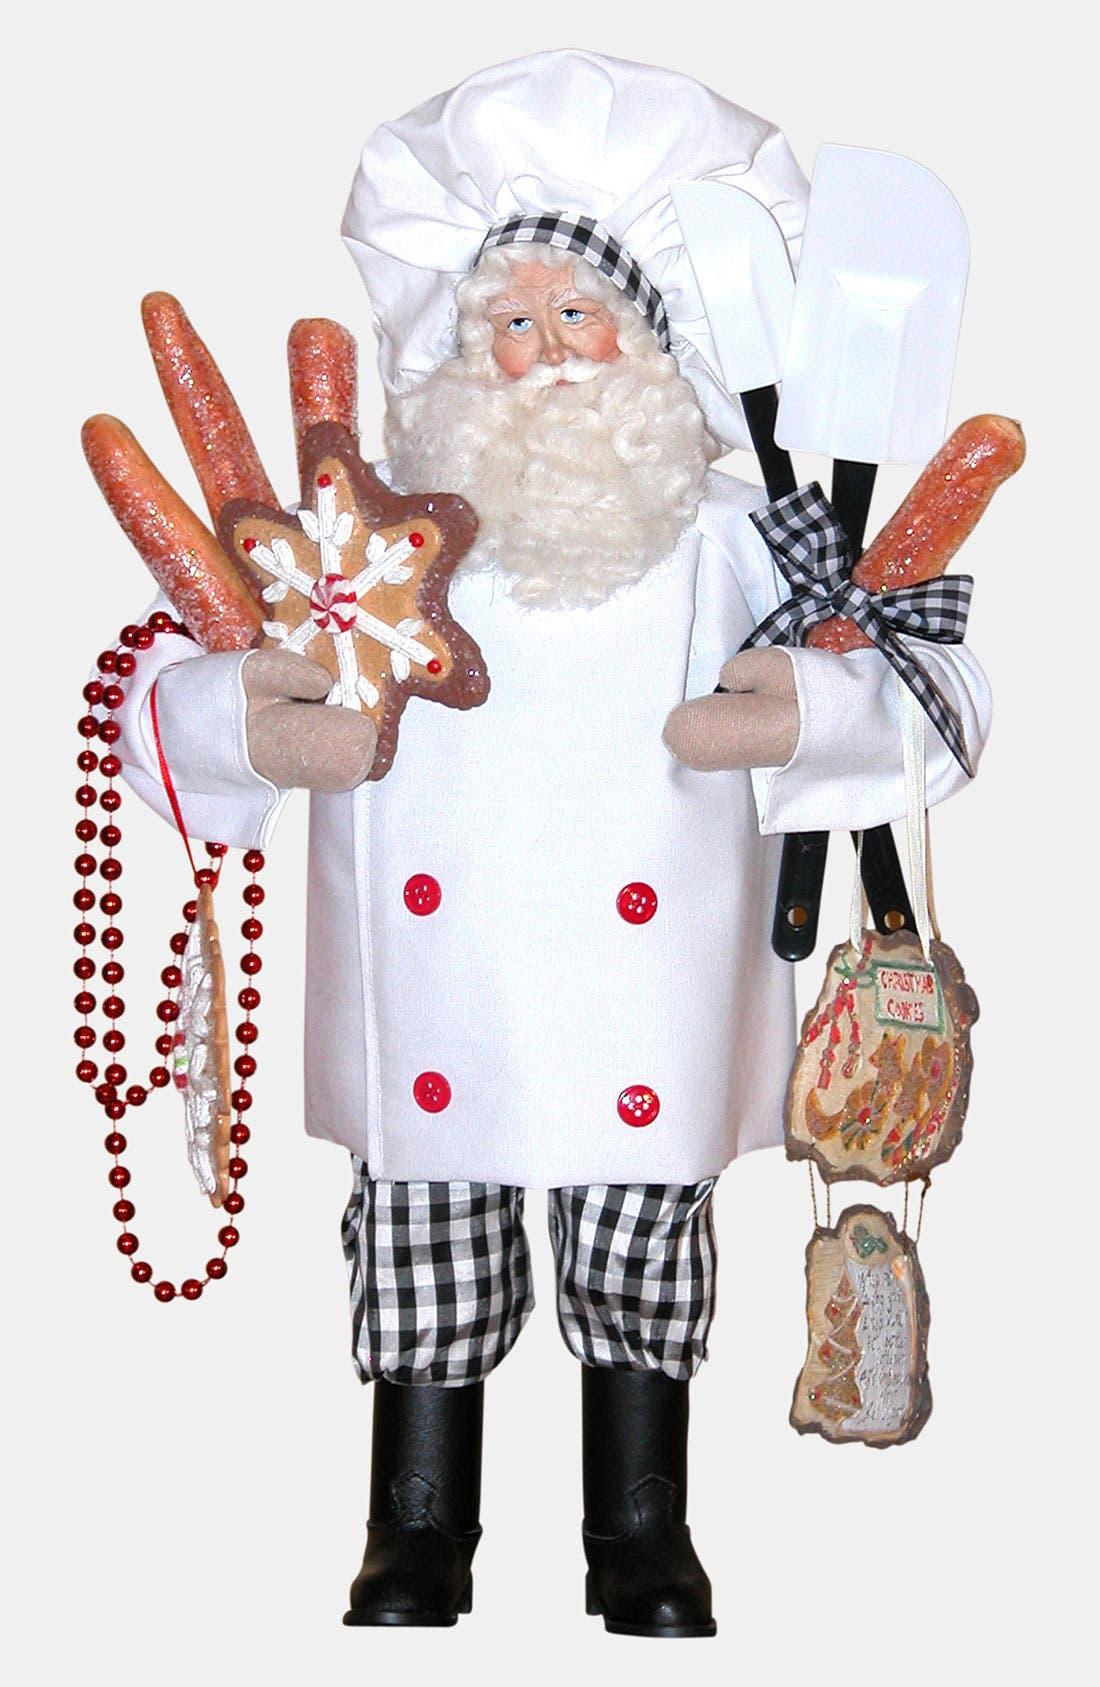 Alternate Image 1 Selected - Lynn Haney 'Sugared Delights' Santa Figurine (Nordstrom Exclusive)